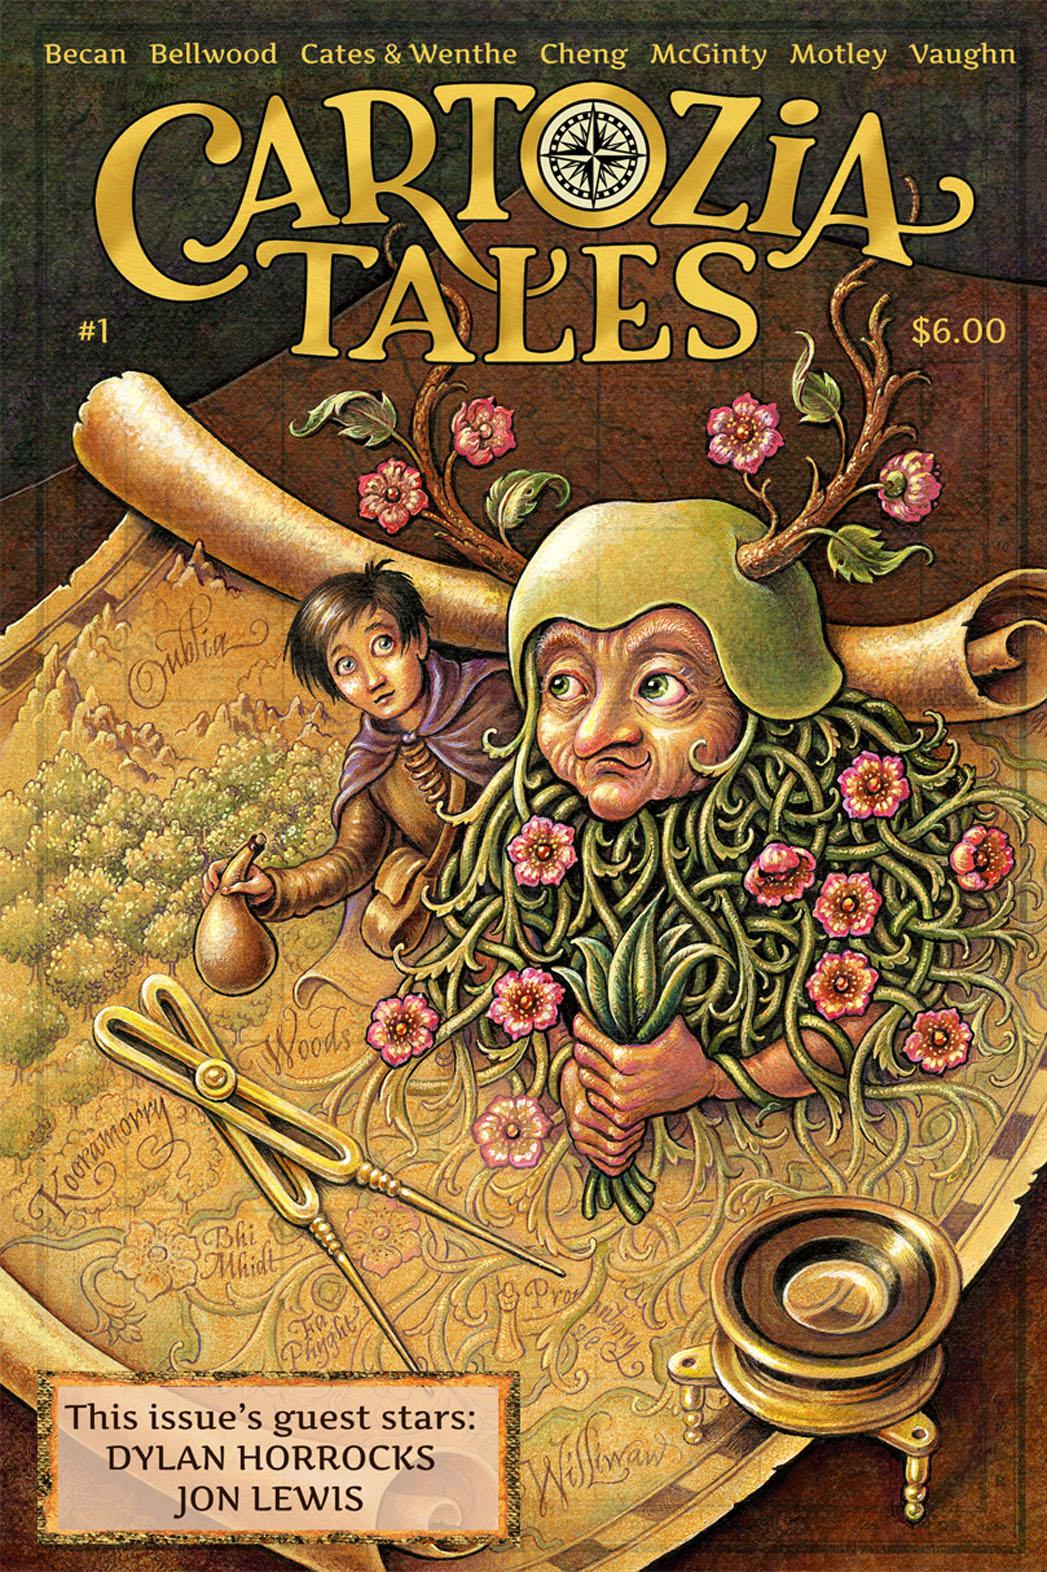 Cartozia Tales Cover - P 2013